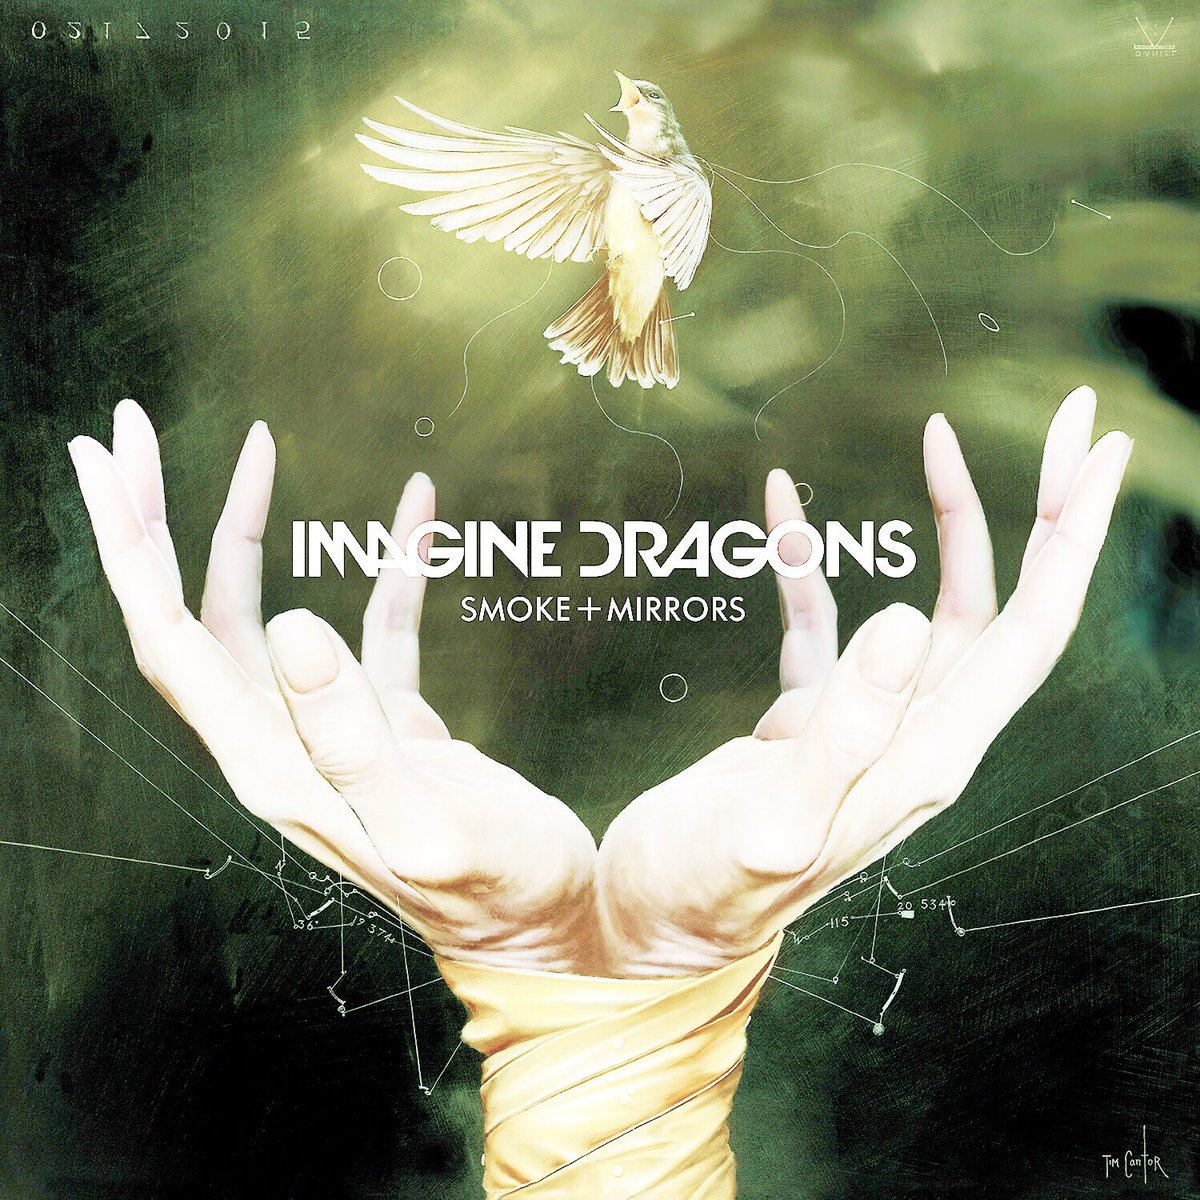 imagine dragons discography torrent kickass